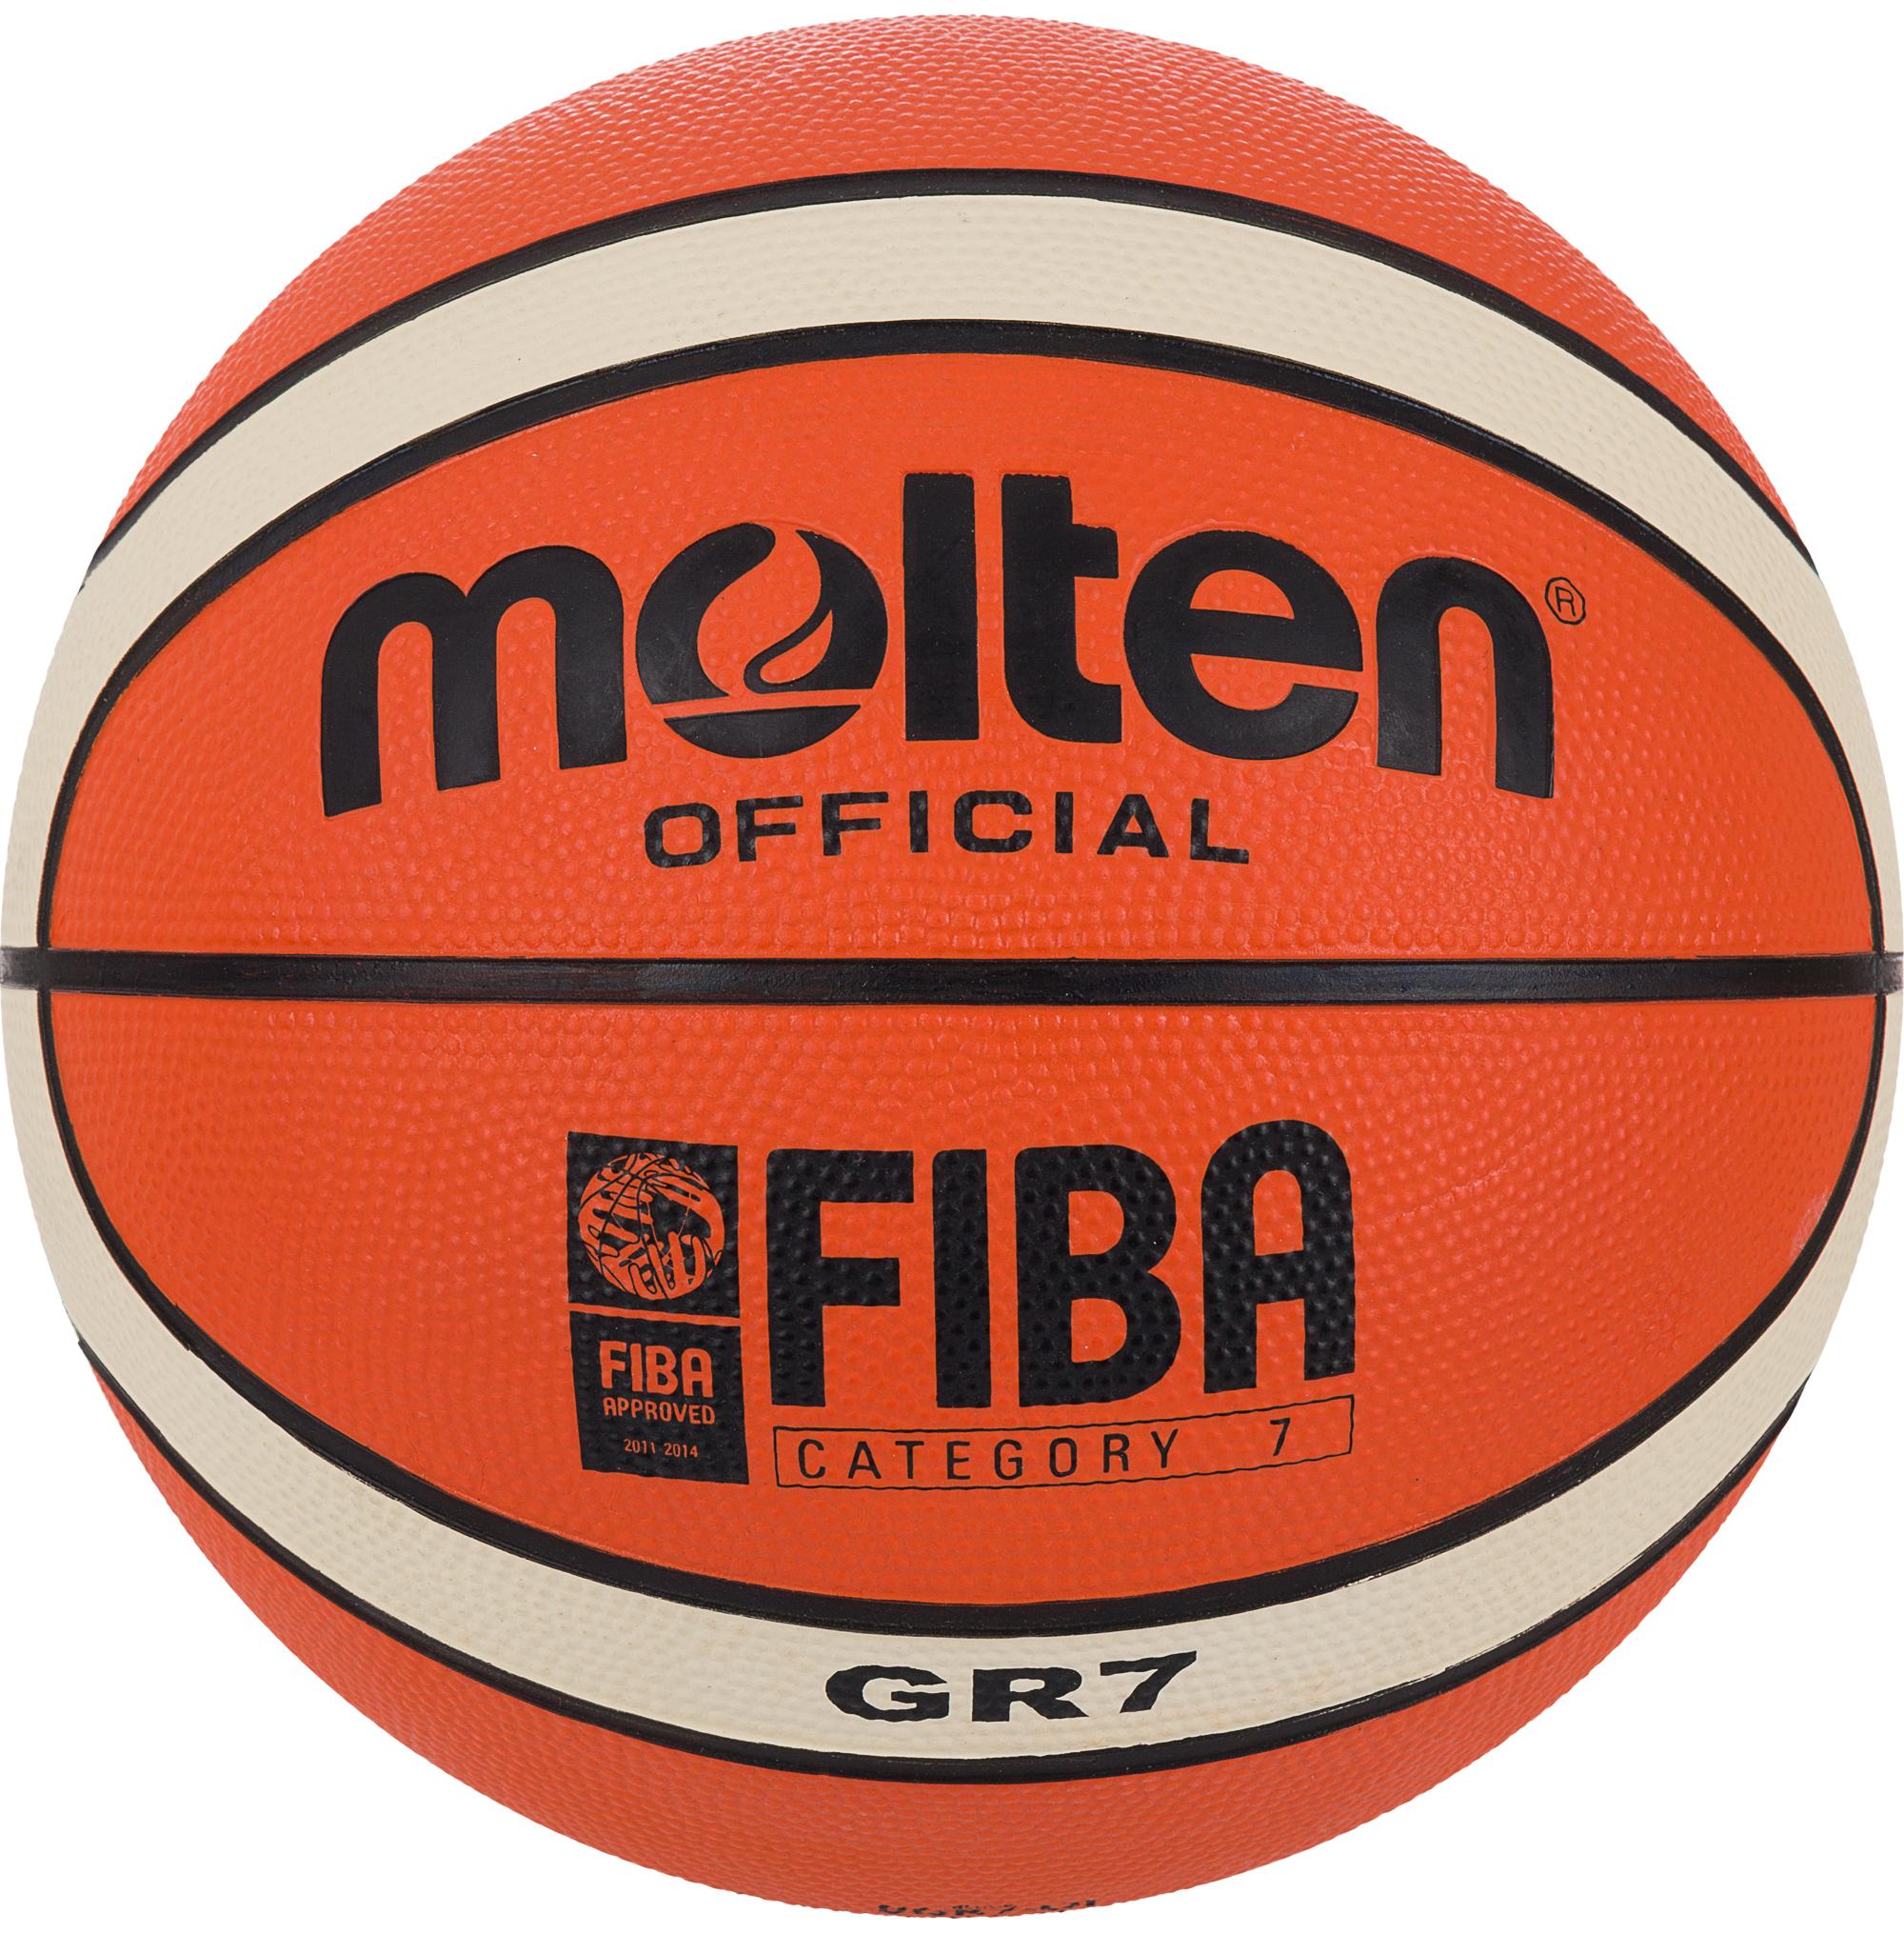 Molten Мяч баскетбольный Molten мяч баскетбольный molten bgm7 р7